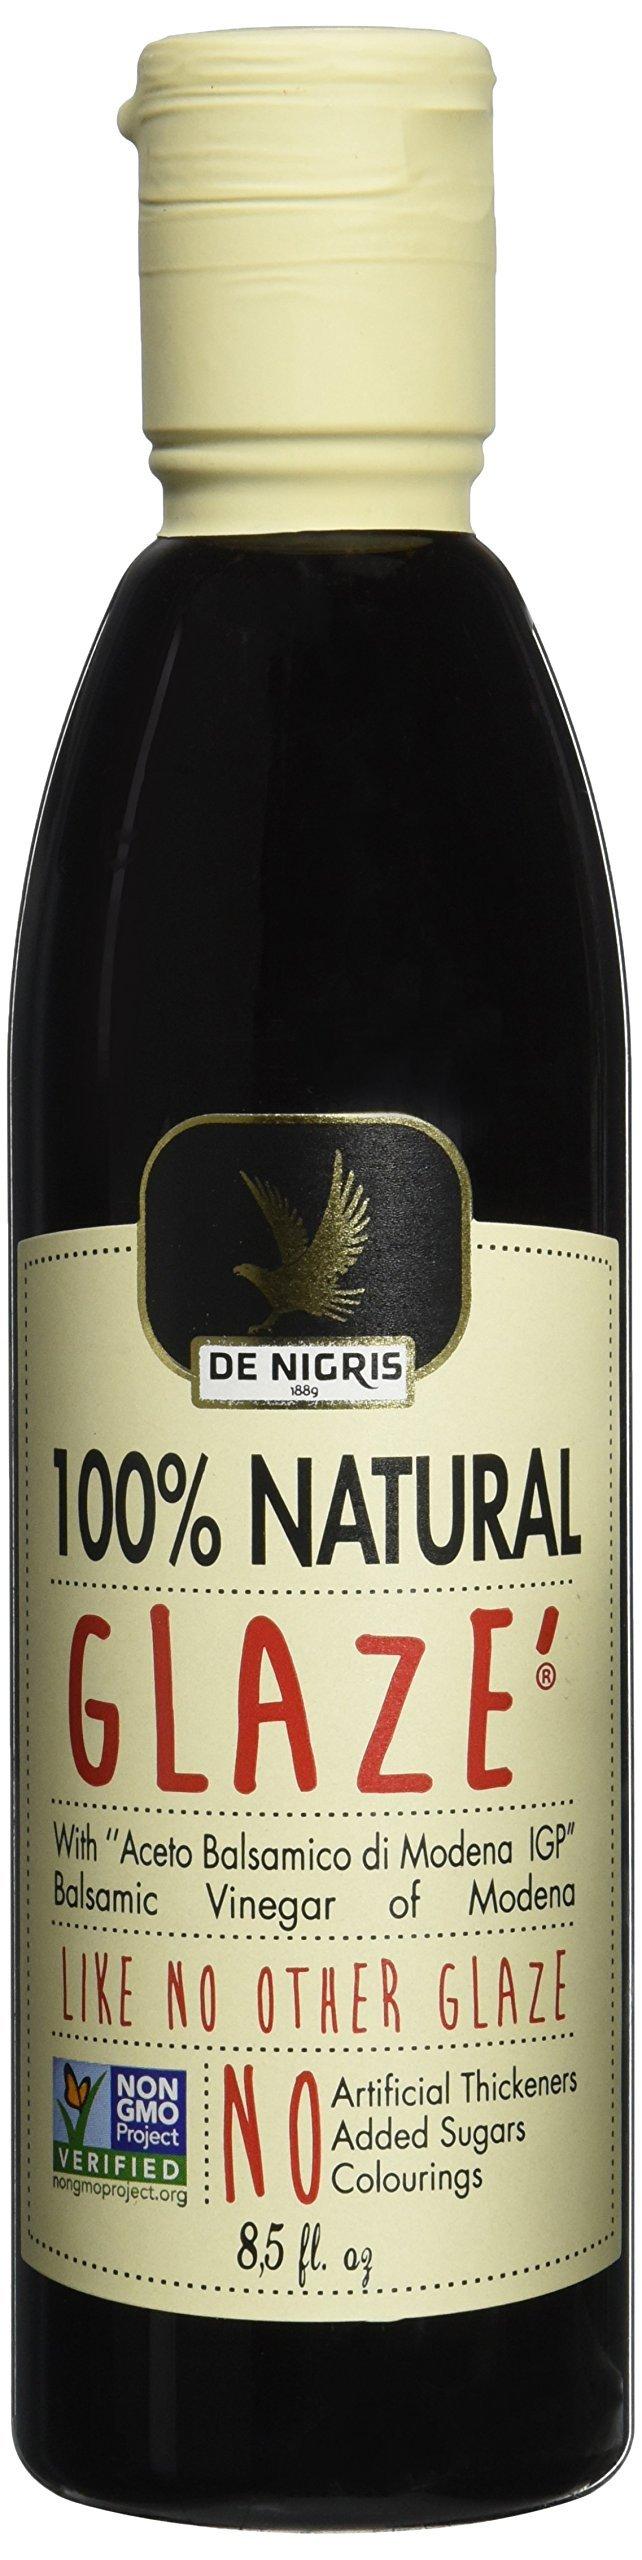 De Nigris 100% Natural Glaze Balsamic Vinegar